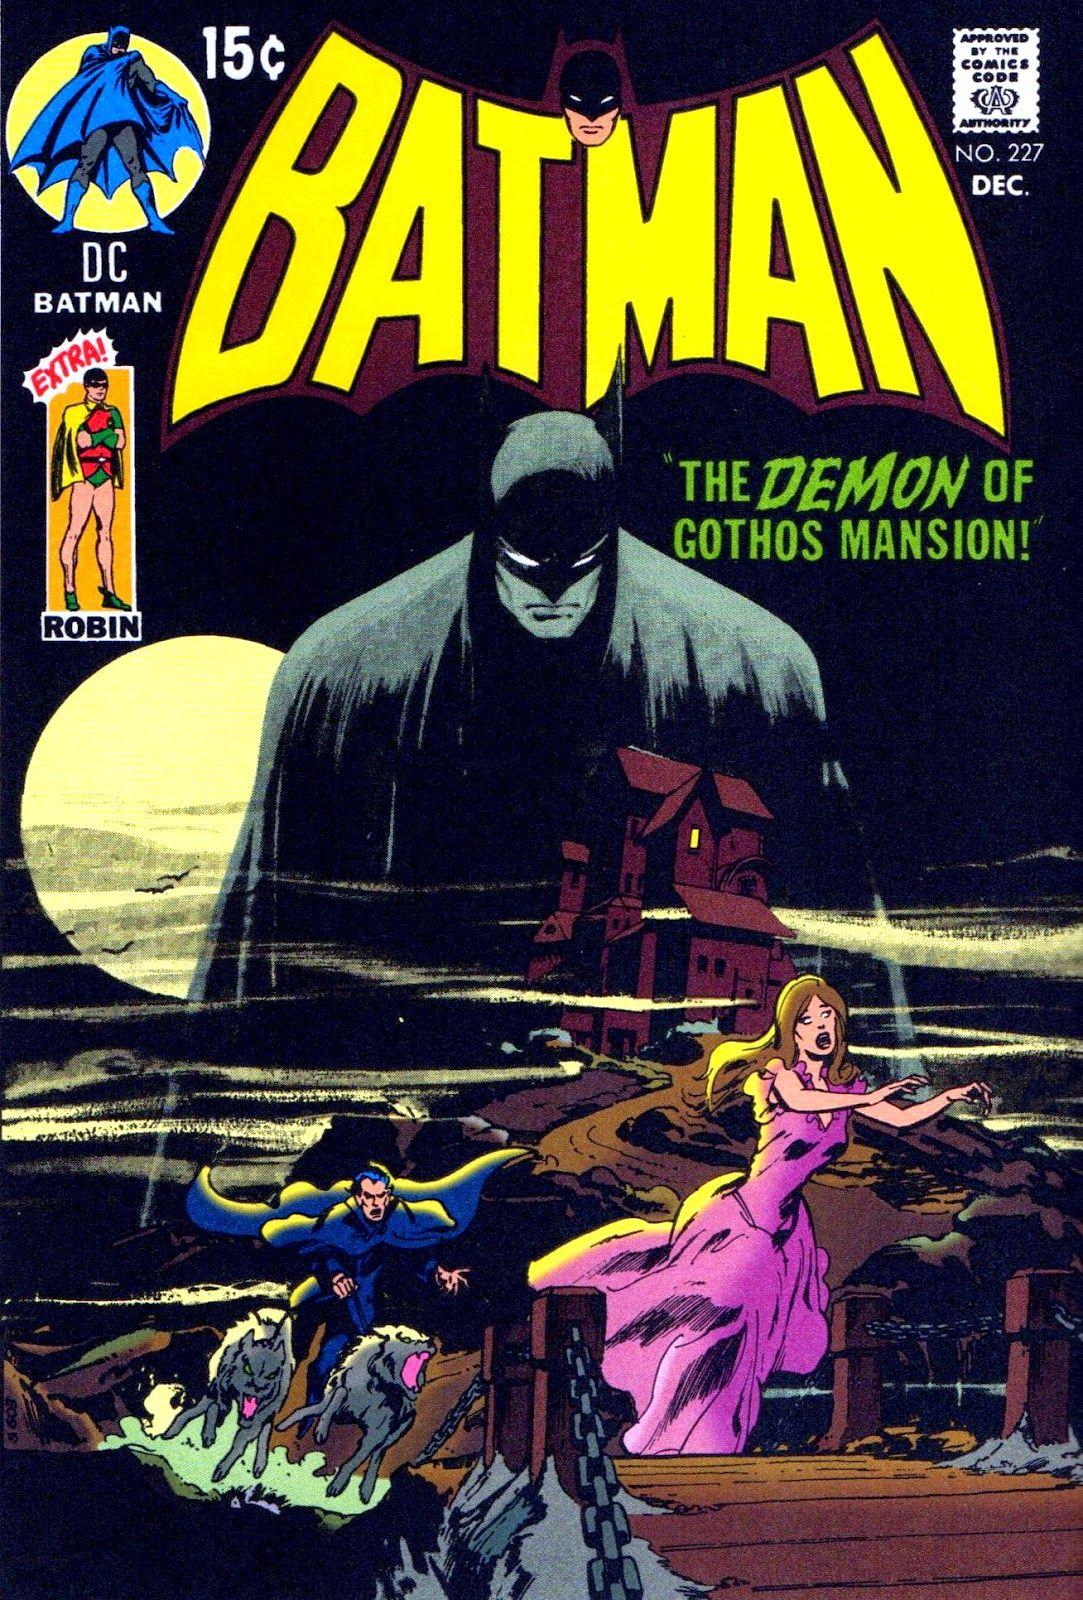 Batman #227 - Pencil & Inks by Neal Adams   HOOBIES   Pinterest